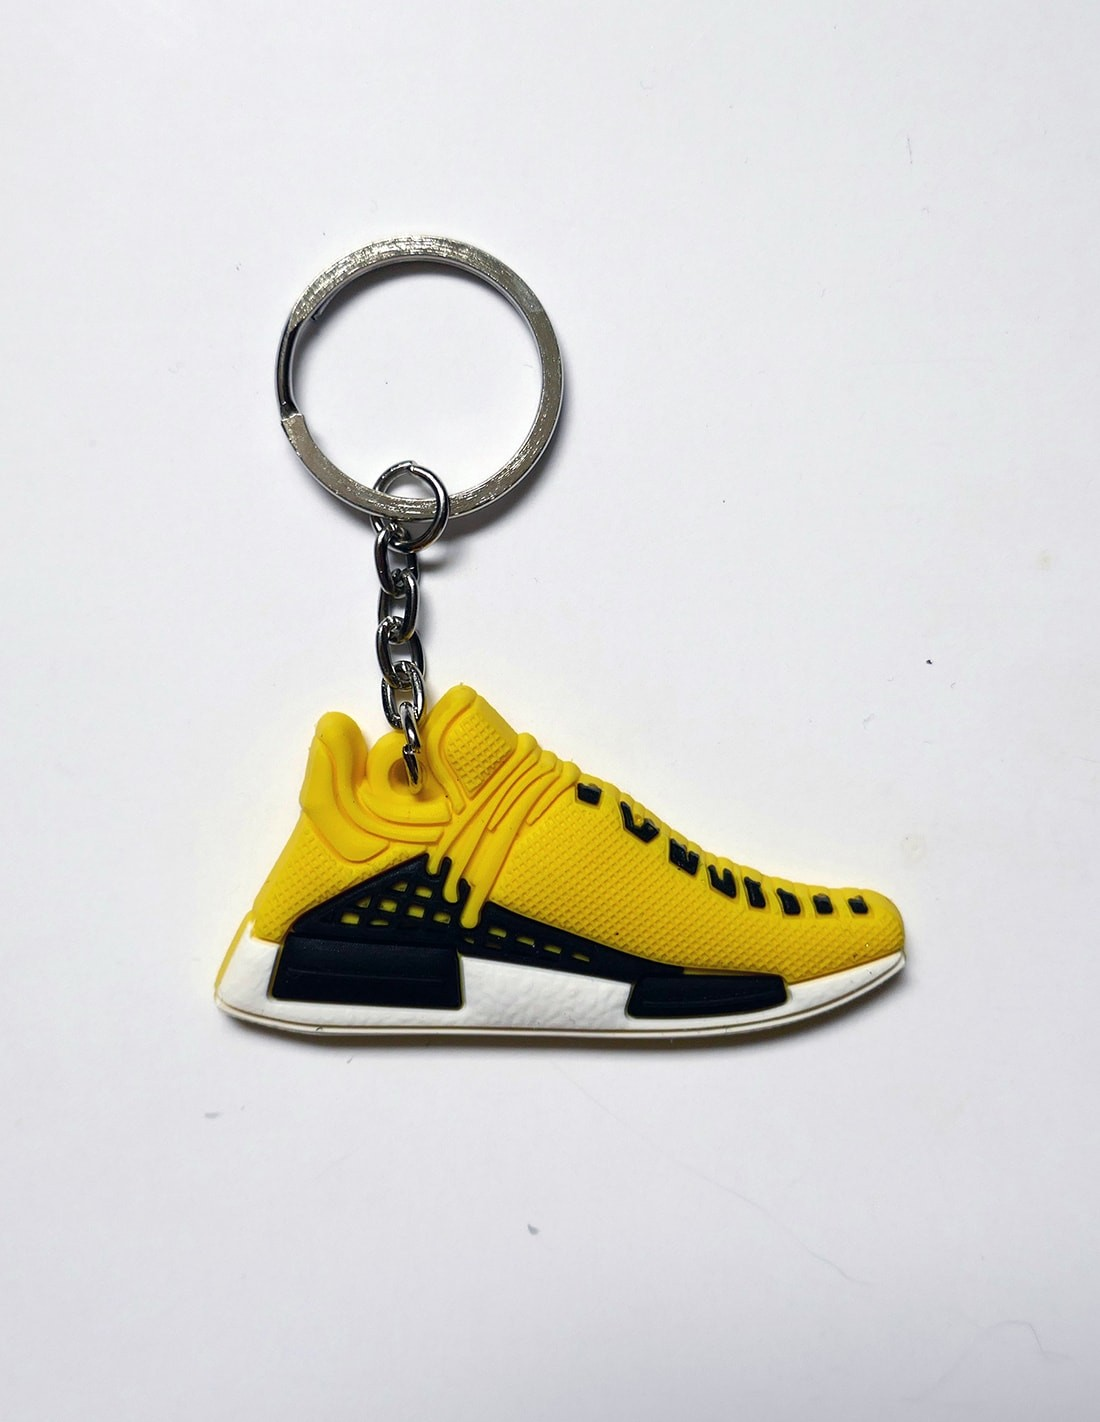 29c7171d1 Porte clé Human race pw pharrell yellow par Adidas